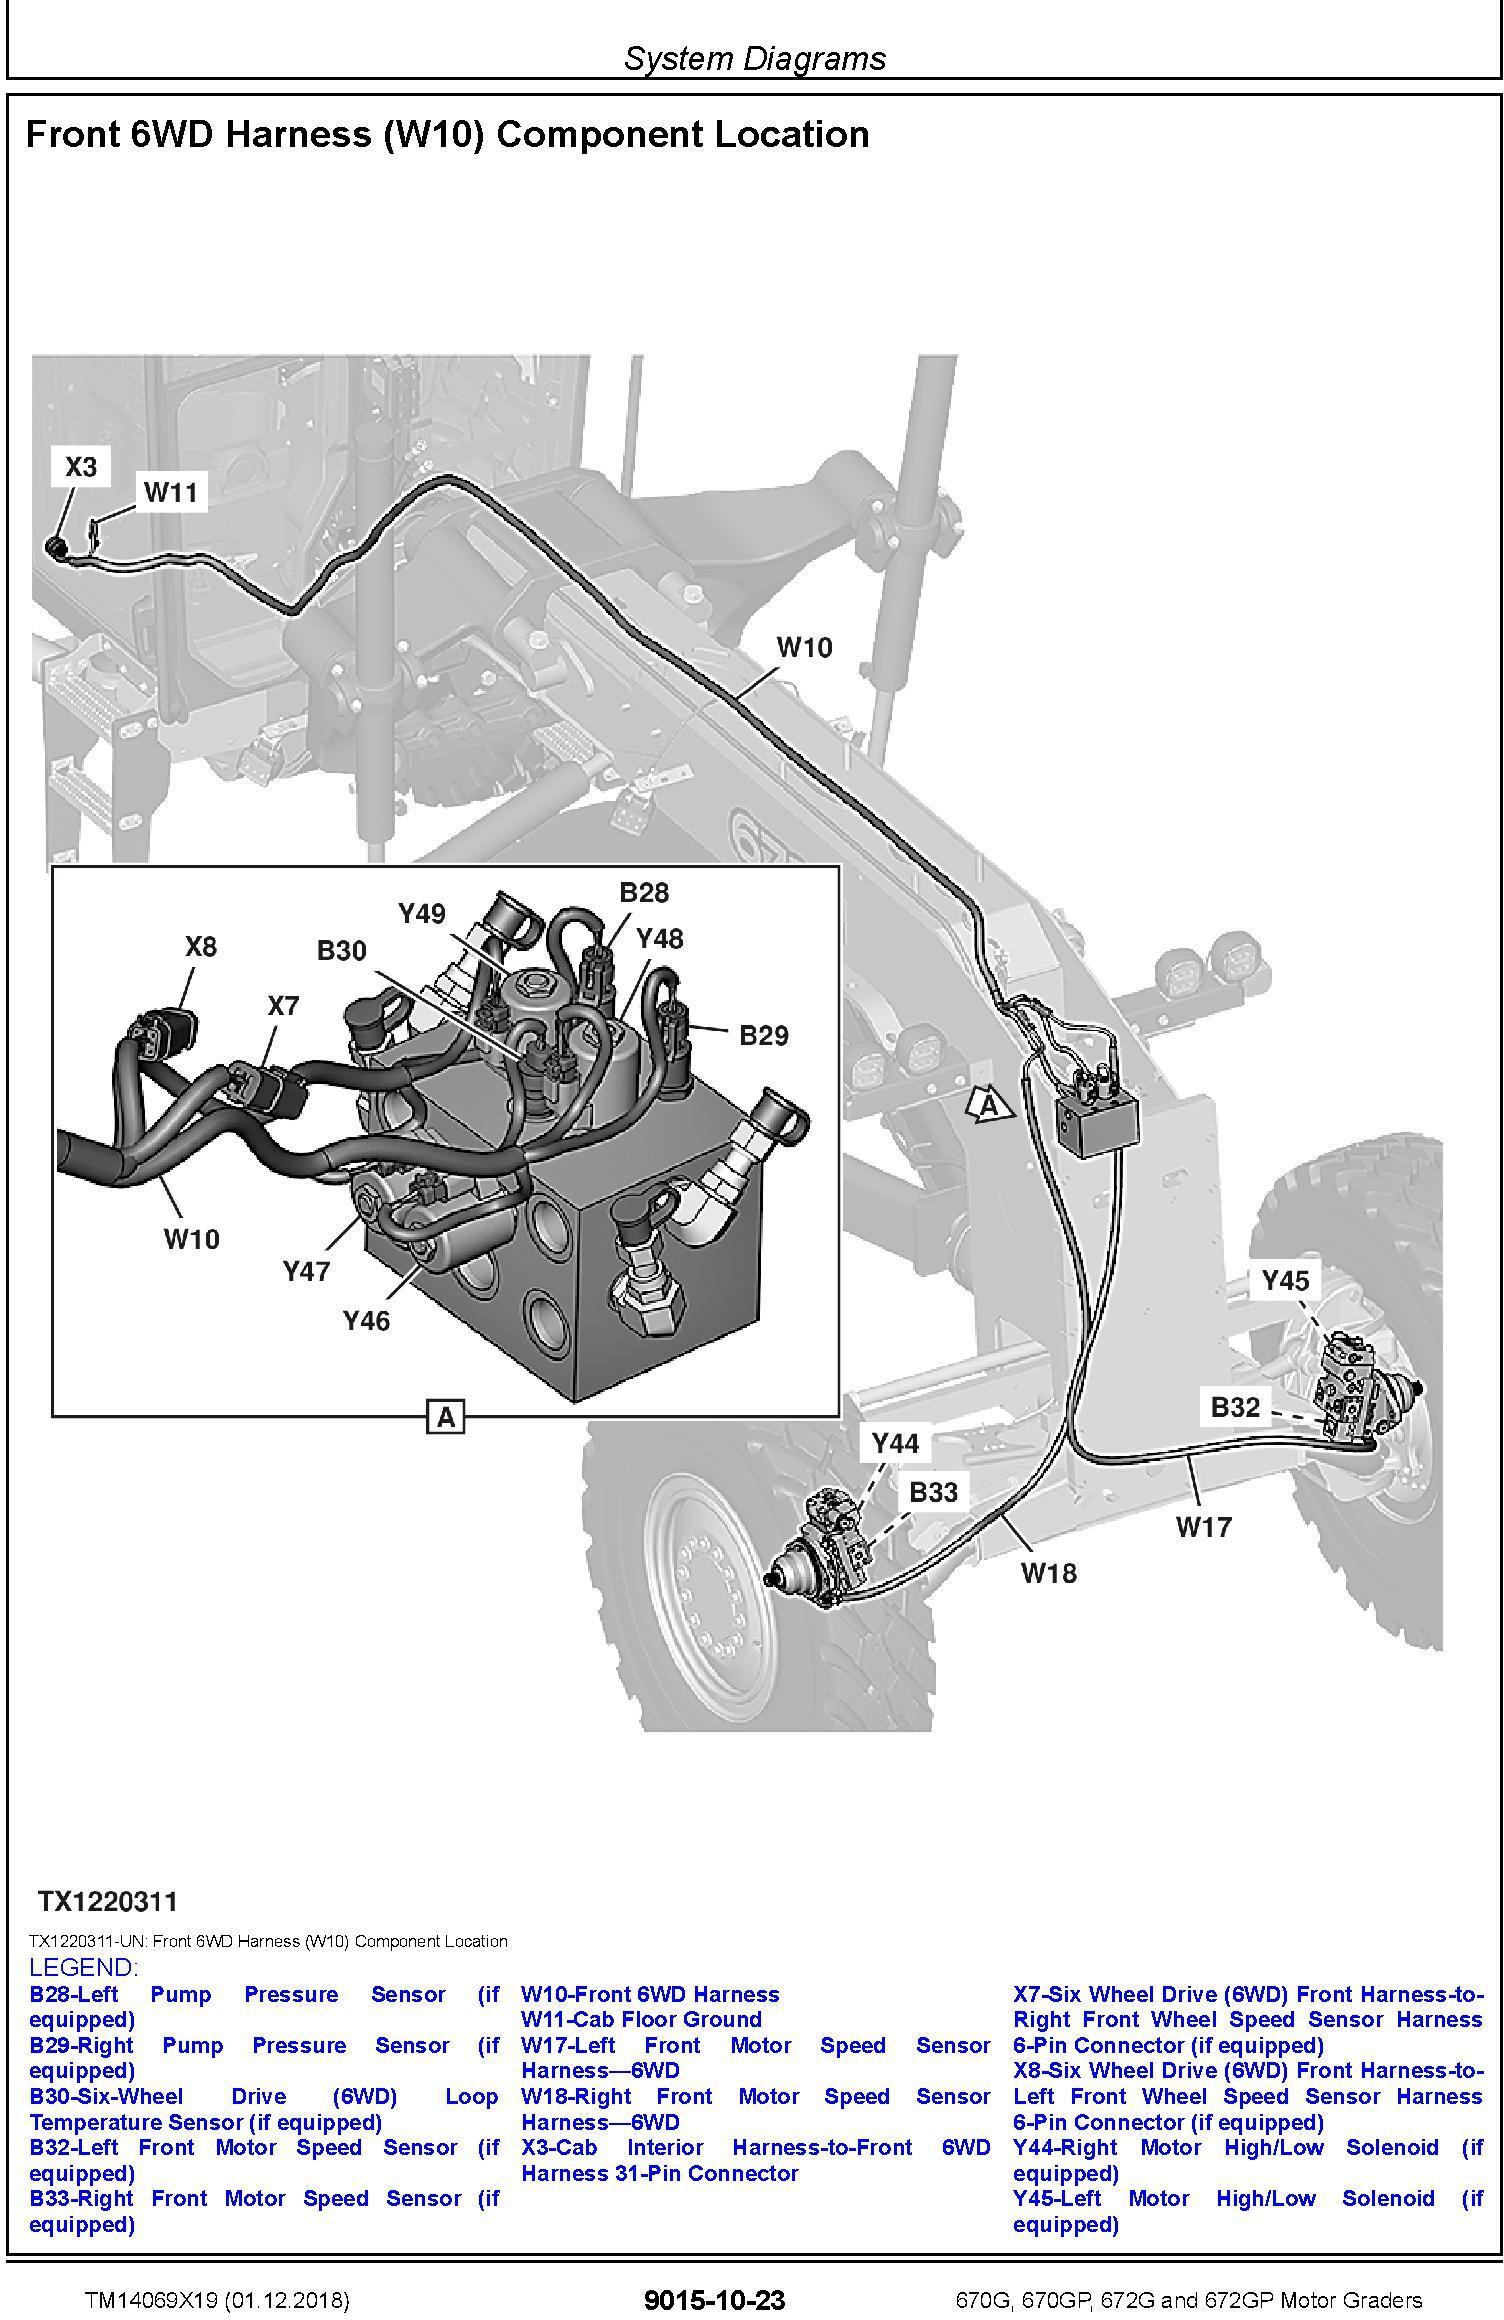 John Deere 670G, 670GP, 672G and 672GP Motor Graders Operation & Test Technical Manual (TM14069X19) - 1